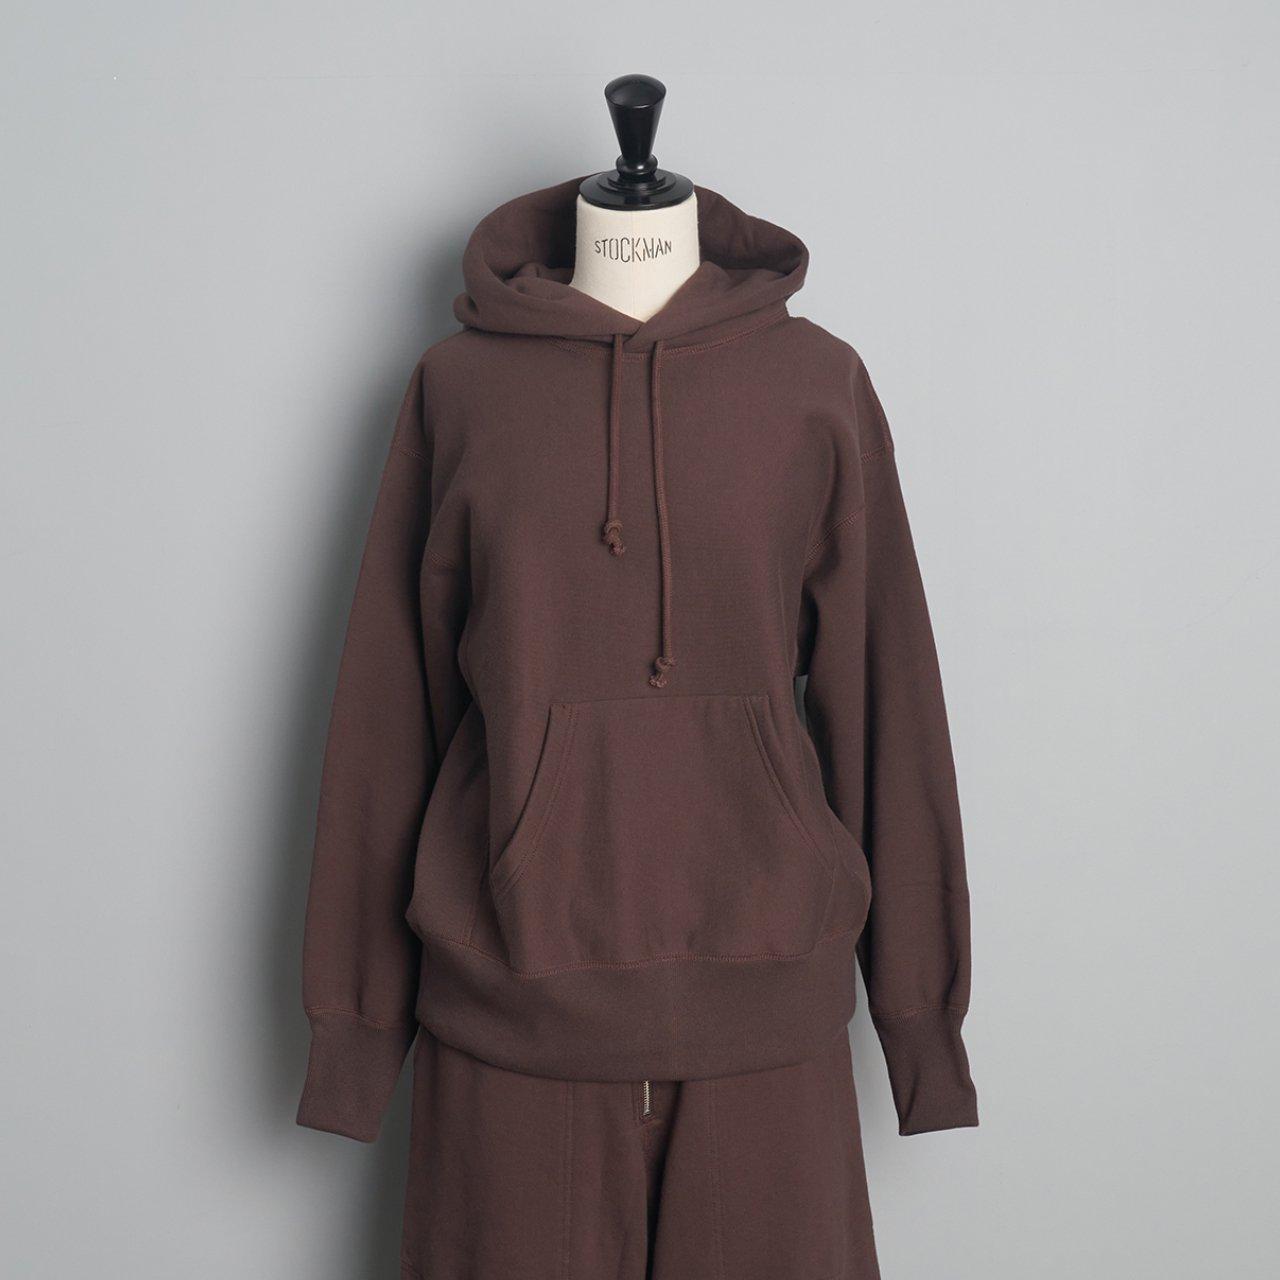 pelleq<BR>heavy weight hooded sweat shirt<BR>soil